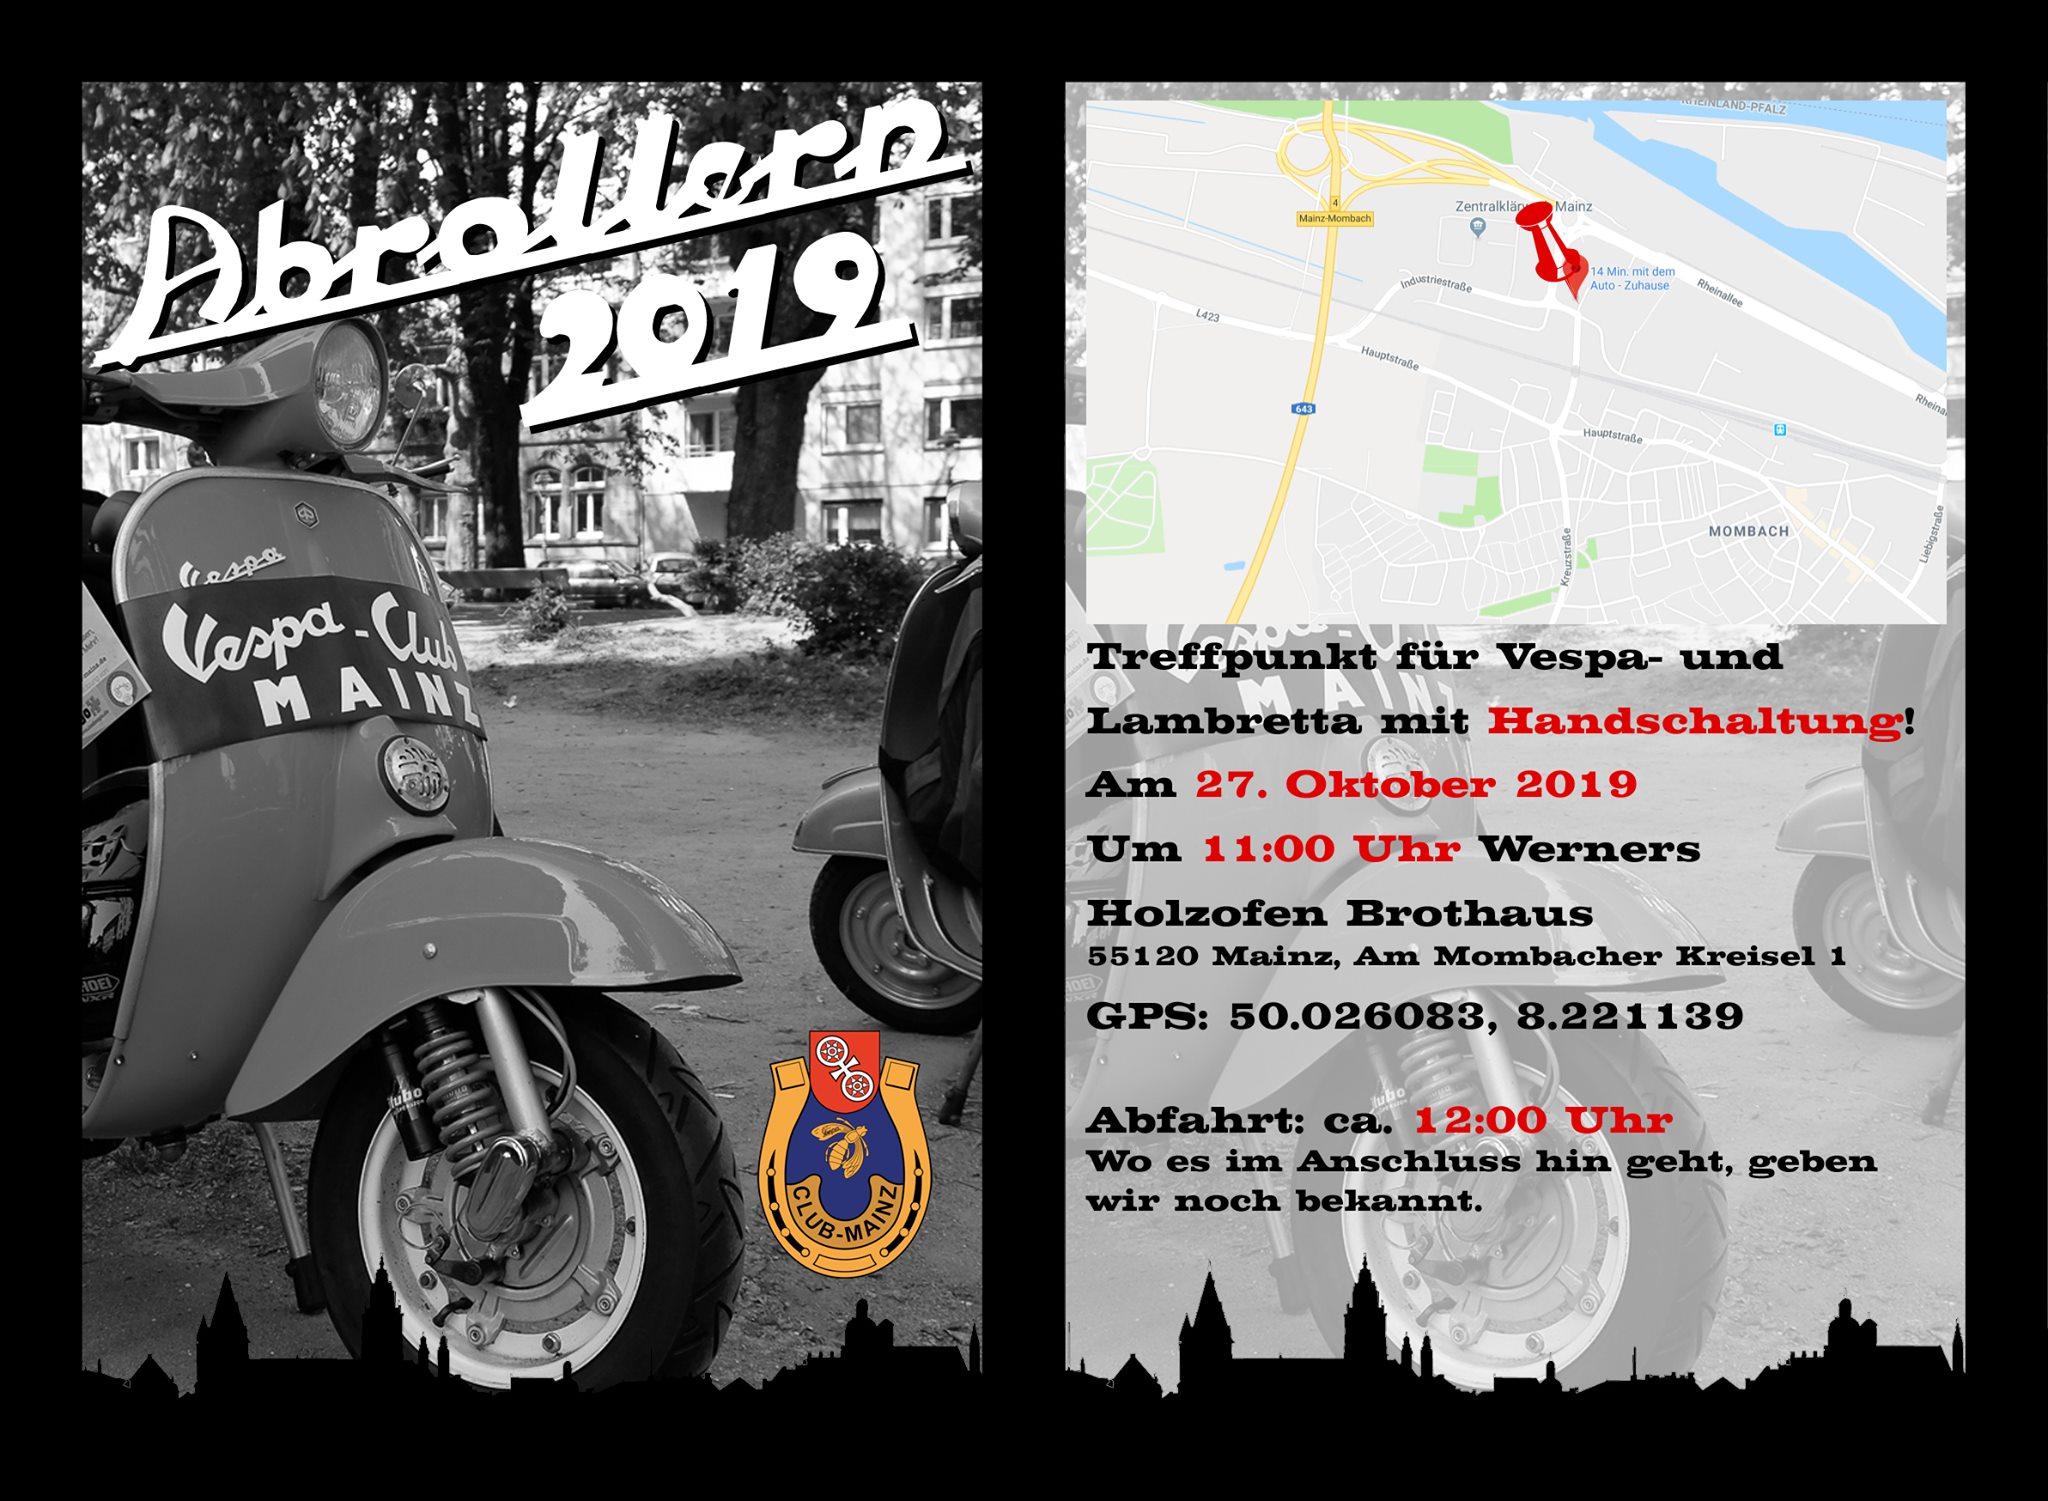 Abrollern 2019 des Vespa-Club Mainz